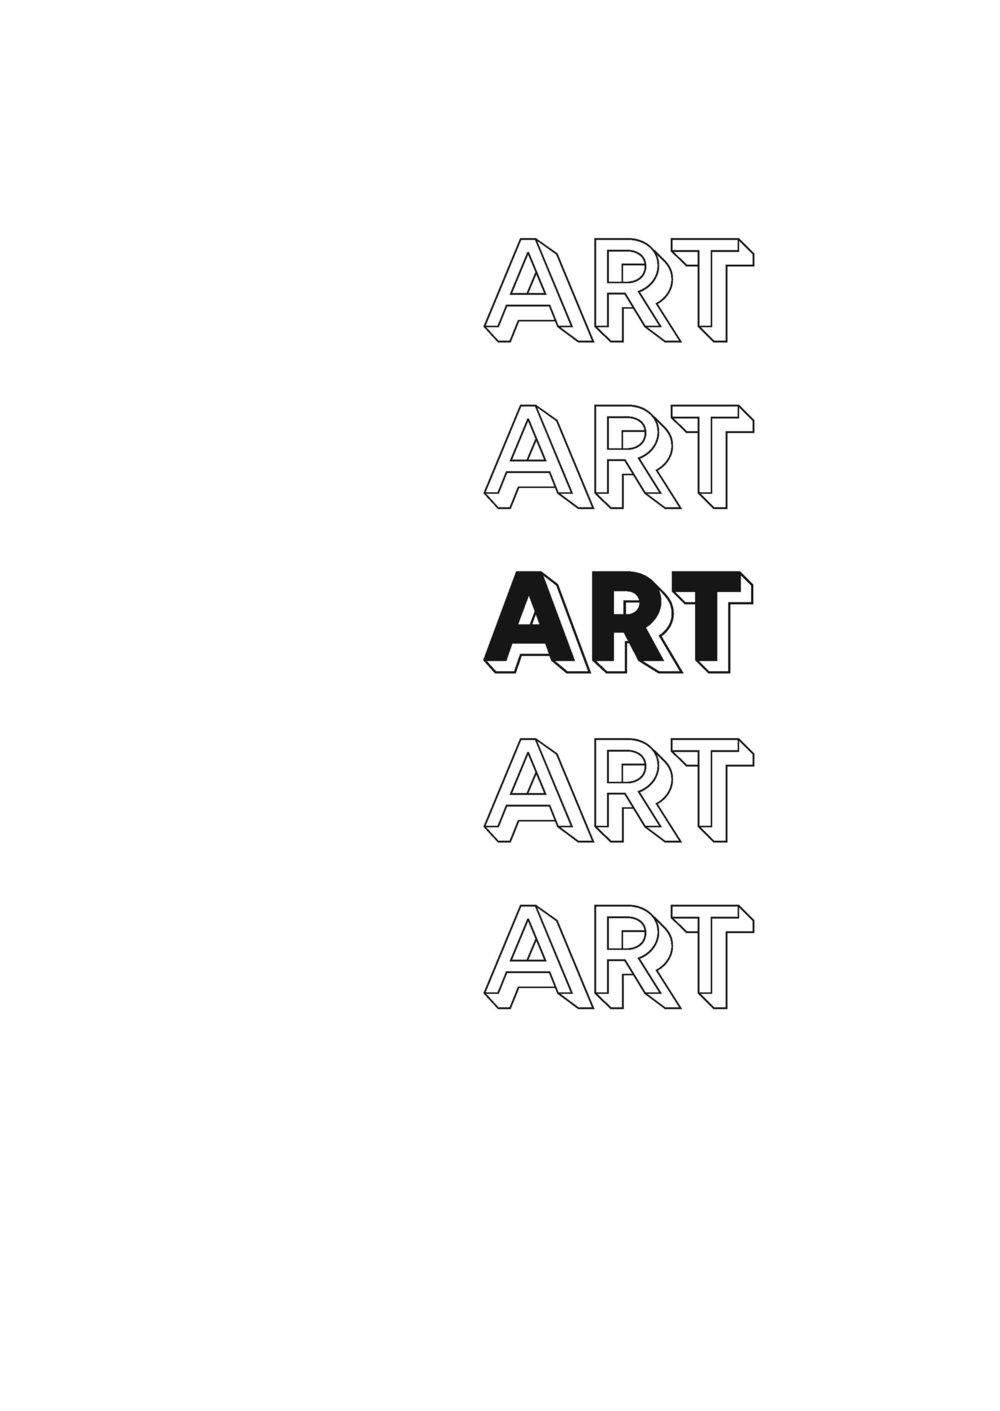 Graphics + Illustration - + vector illustration+ invitations, event signage, lettering+ logos / tee graphics